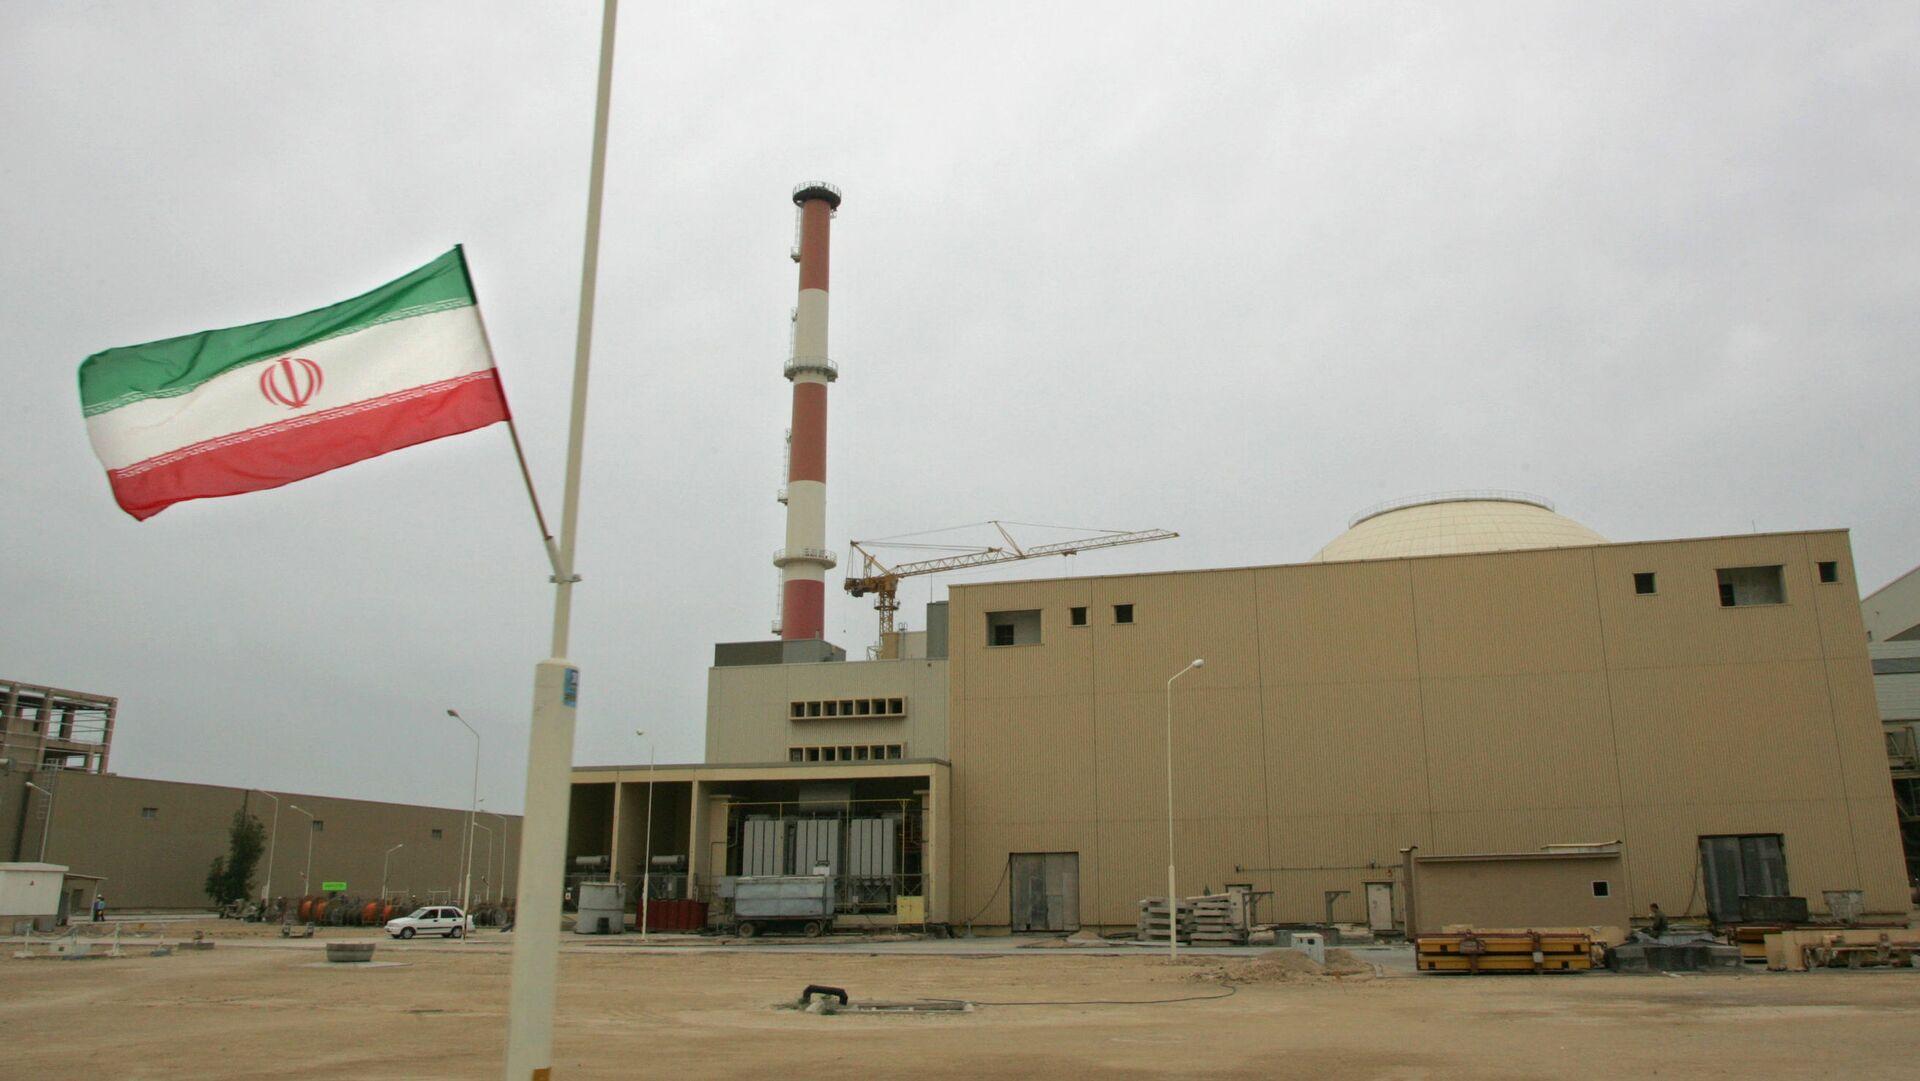 La bandera de Irán junto a la planta nuclear de Bushehr - Sputnik Mundo, 1920, 24.08.2021